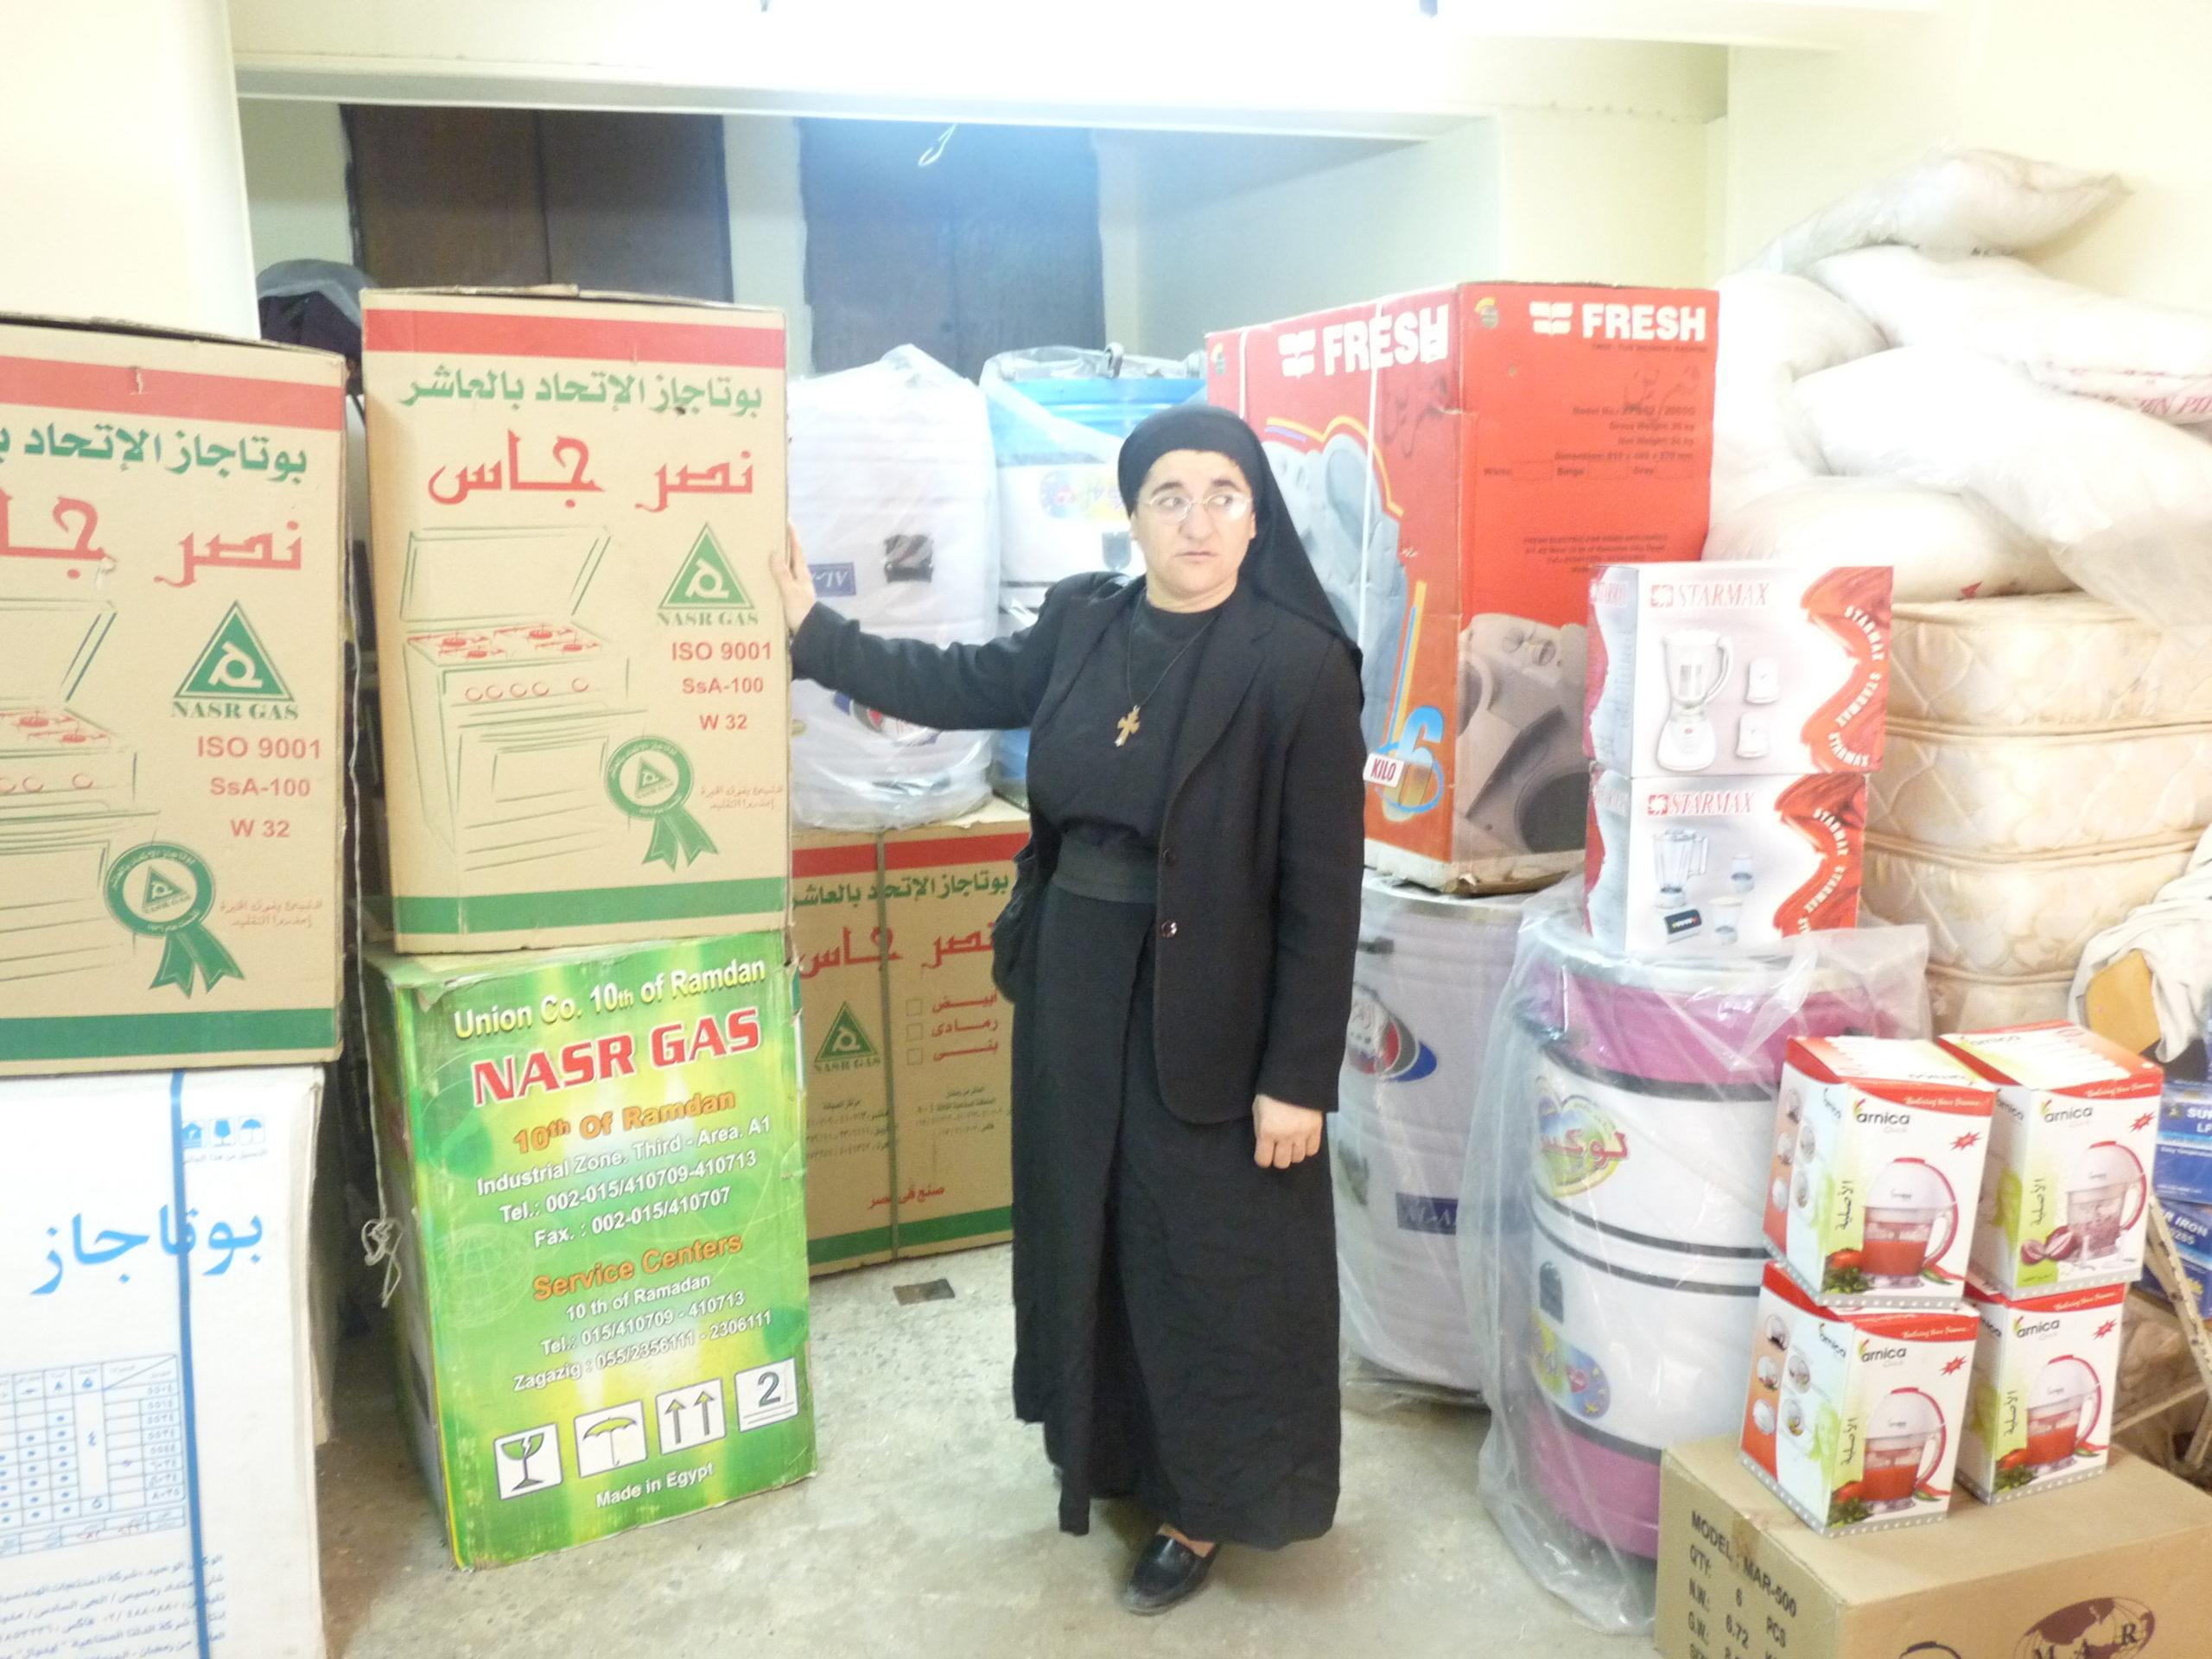 Reisebericht Ägypten 9.-19. Februar 2017